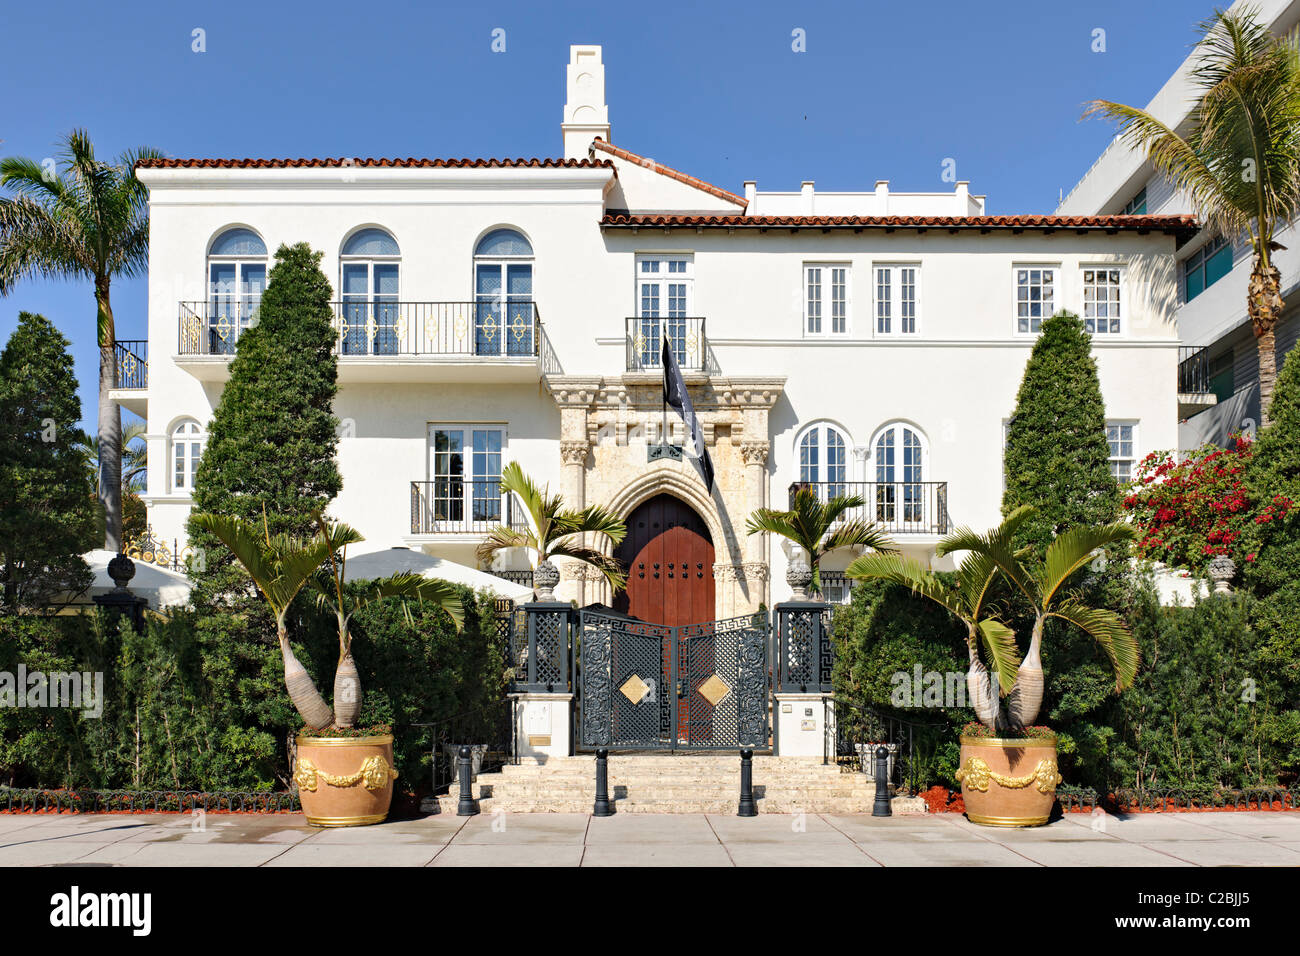 Versace Mansion Villa Barton G Weiss, South Beach, Miami - Stock Image